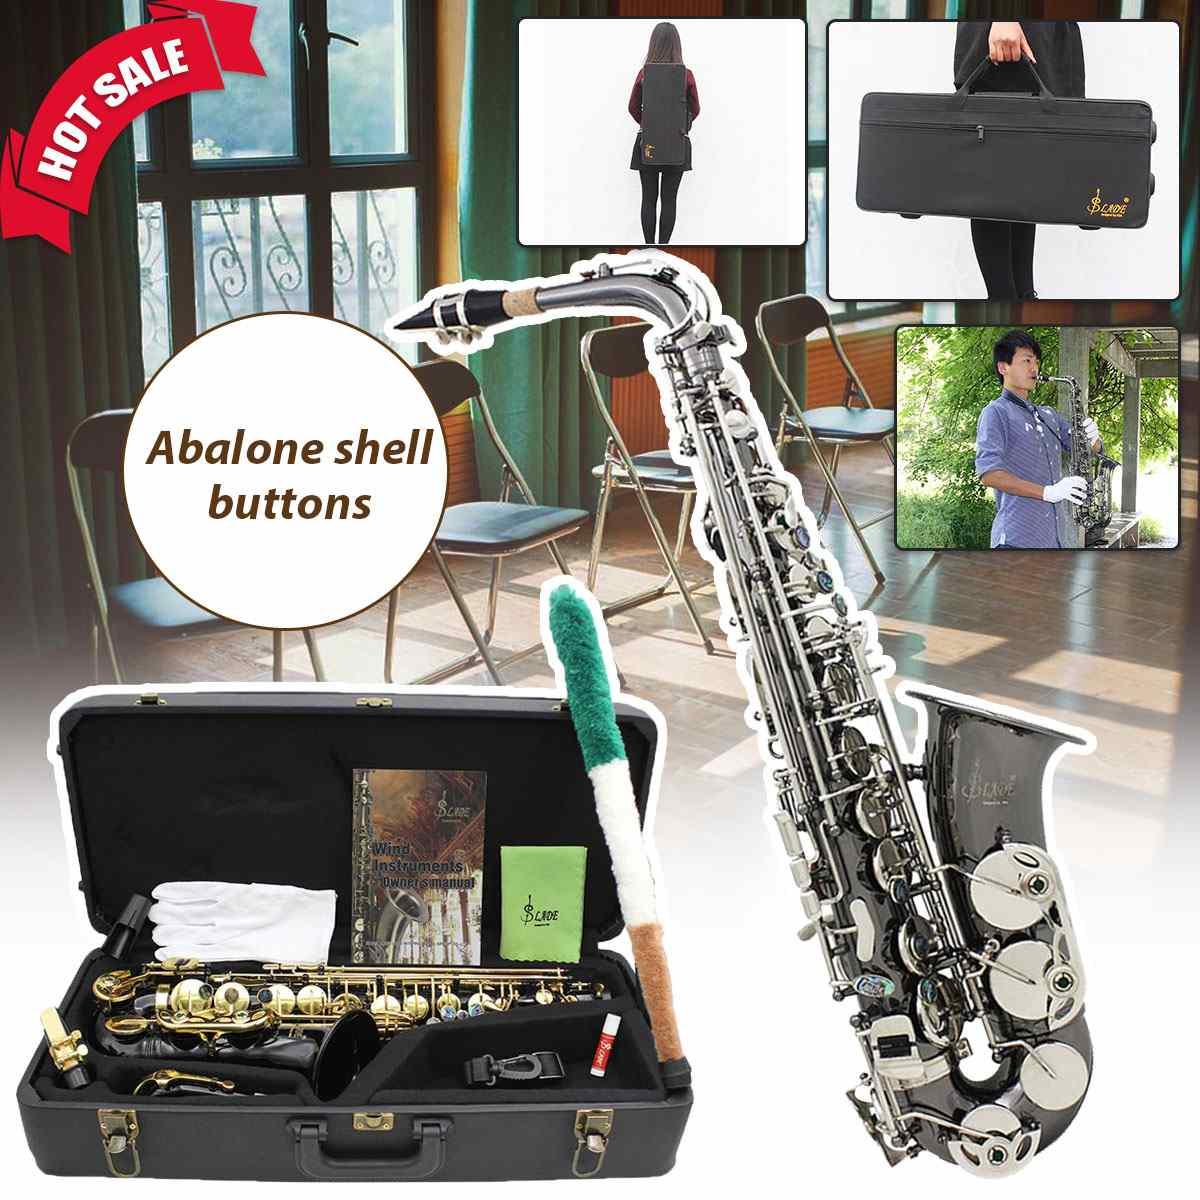 Black Nickel Body Silver Keys Alto Saxophone Sax Musical Instruments swan 37 keys melodica black color teaching music fundamentals mouth organ melodica musical instruments accordion accessories